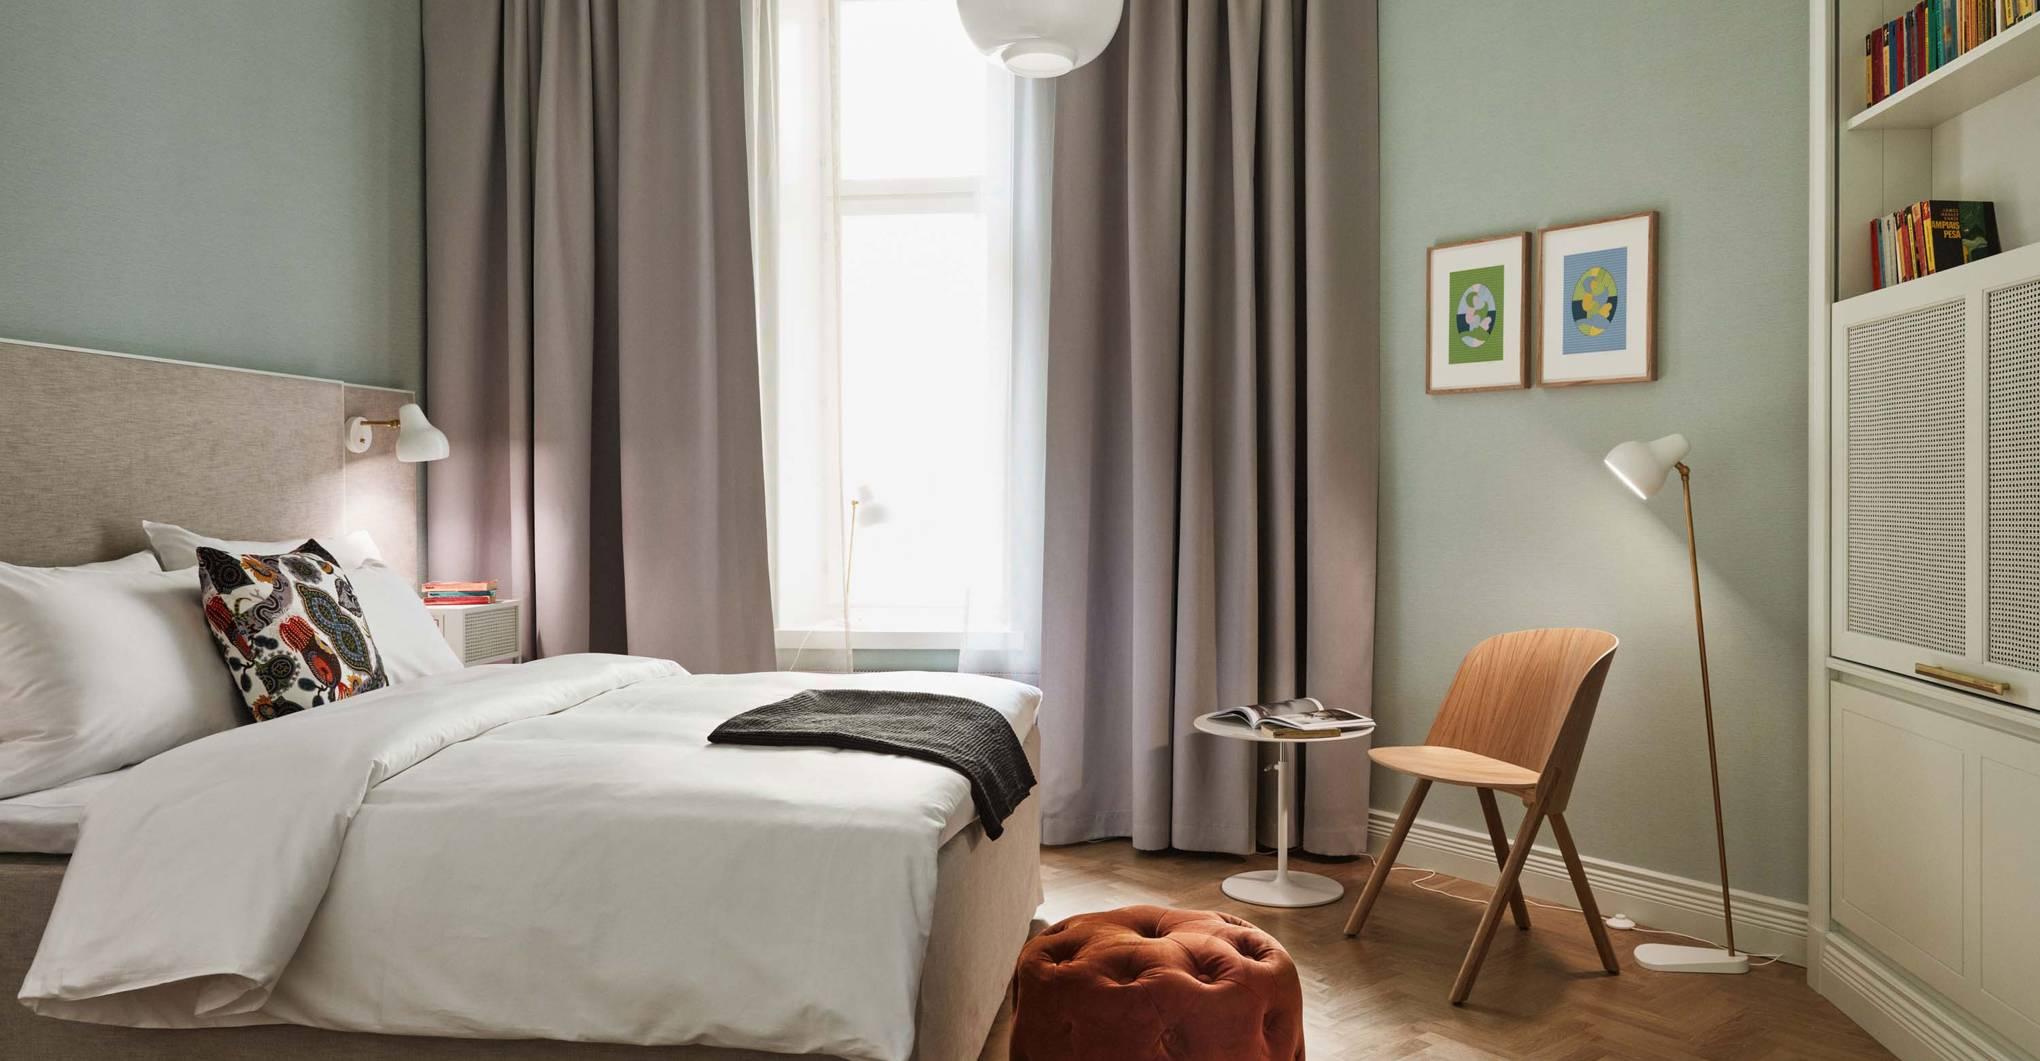 Hotel St George, Helsinki hotel review